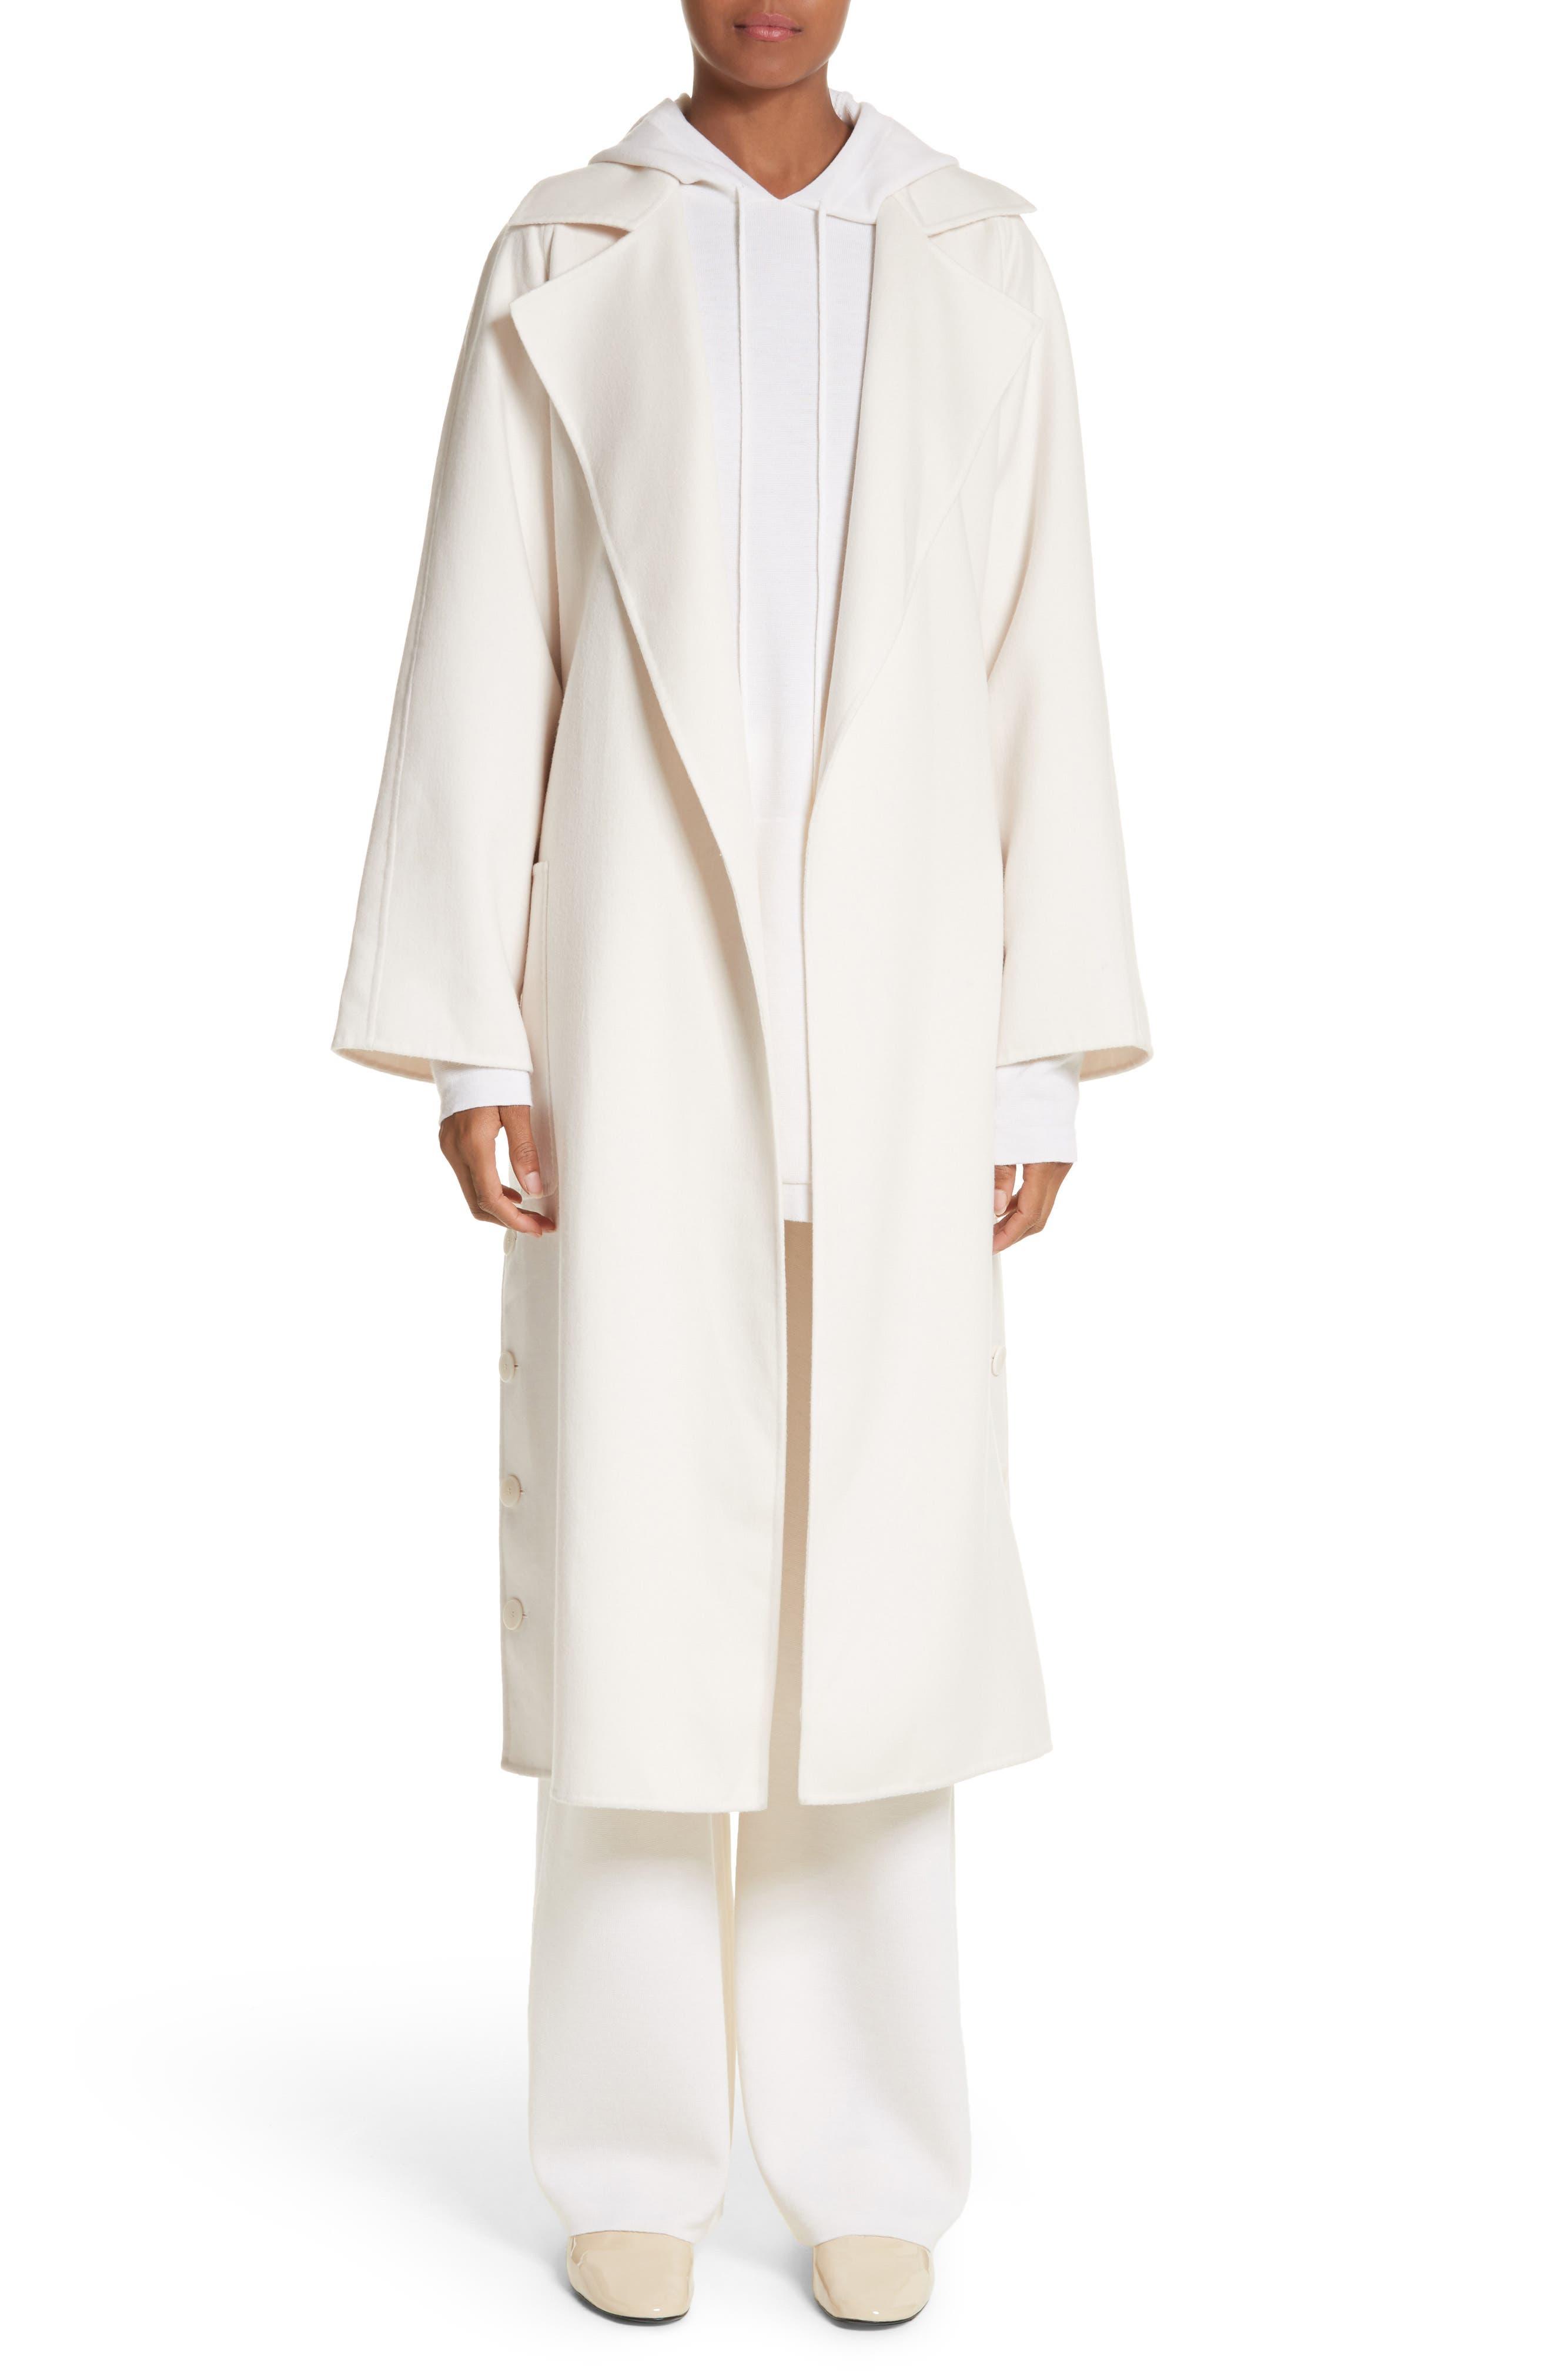 Alacre Wool & Cashmere Coat,                             Alternate thumbnail 7, color,                             110